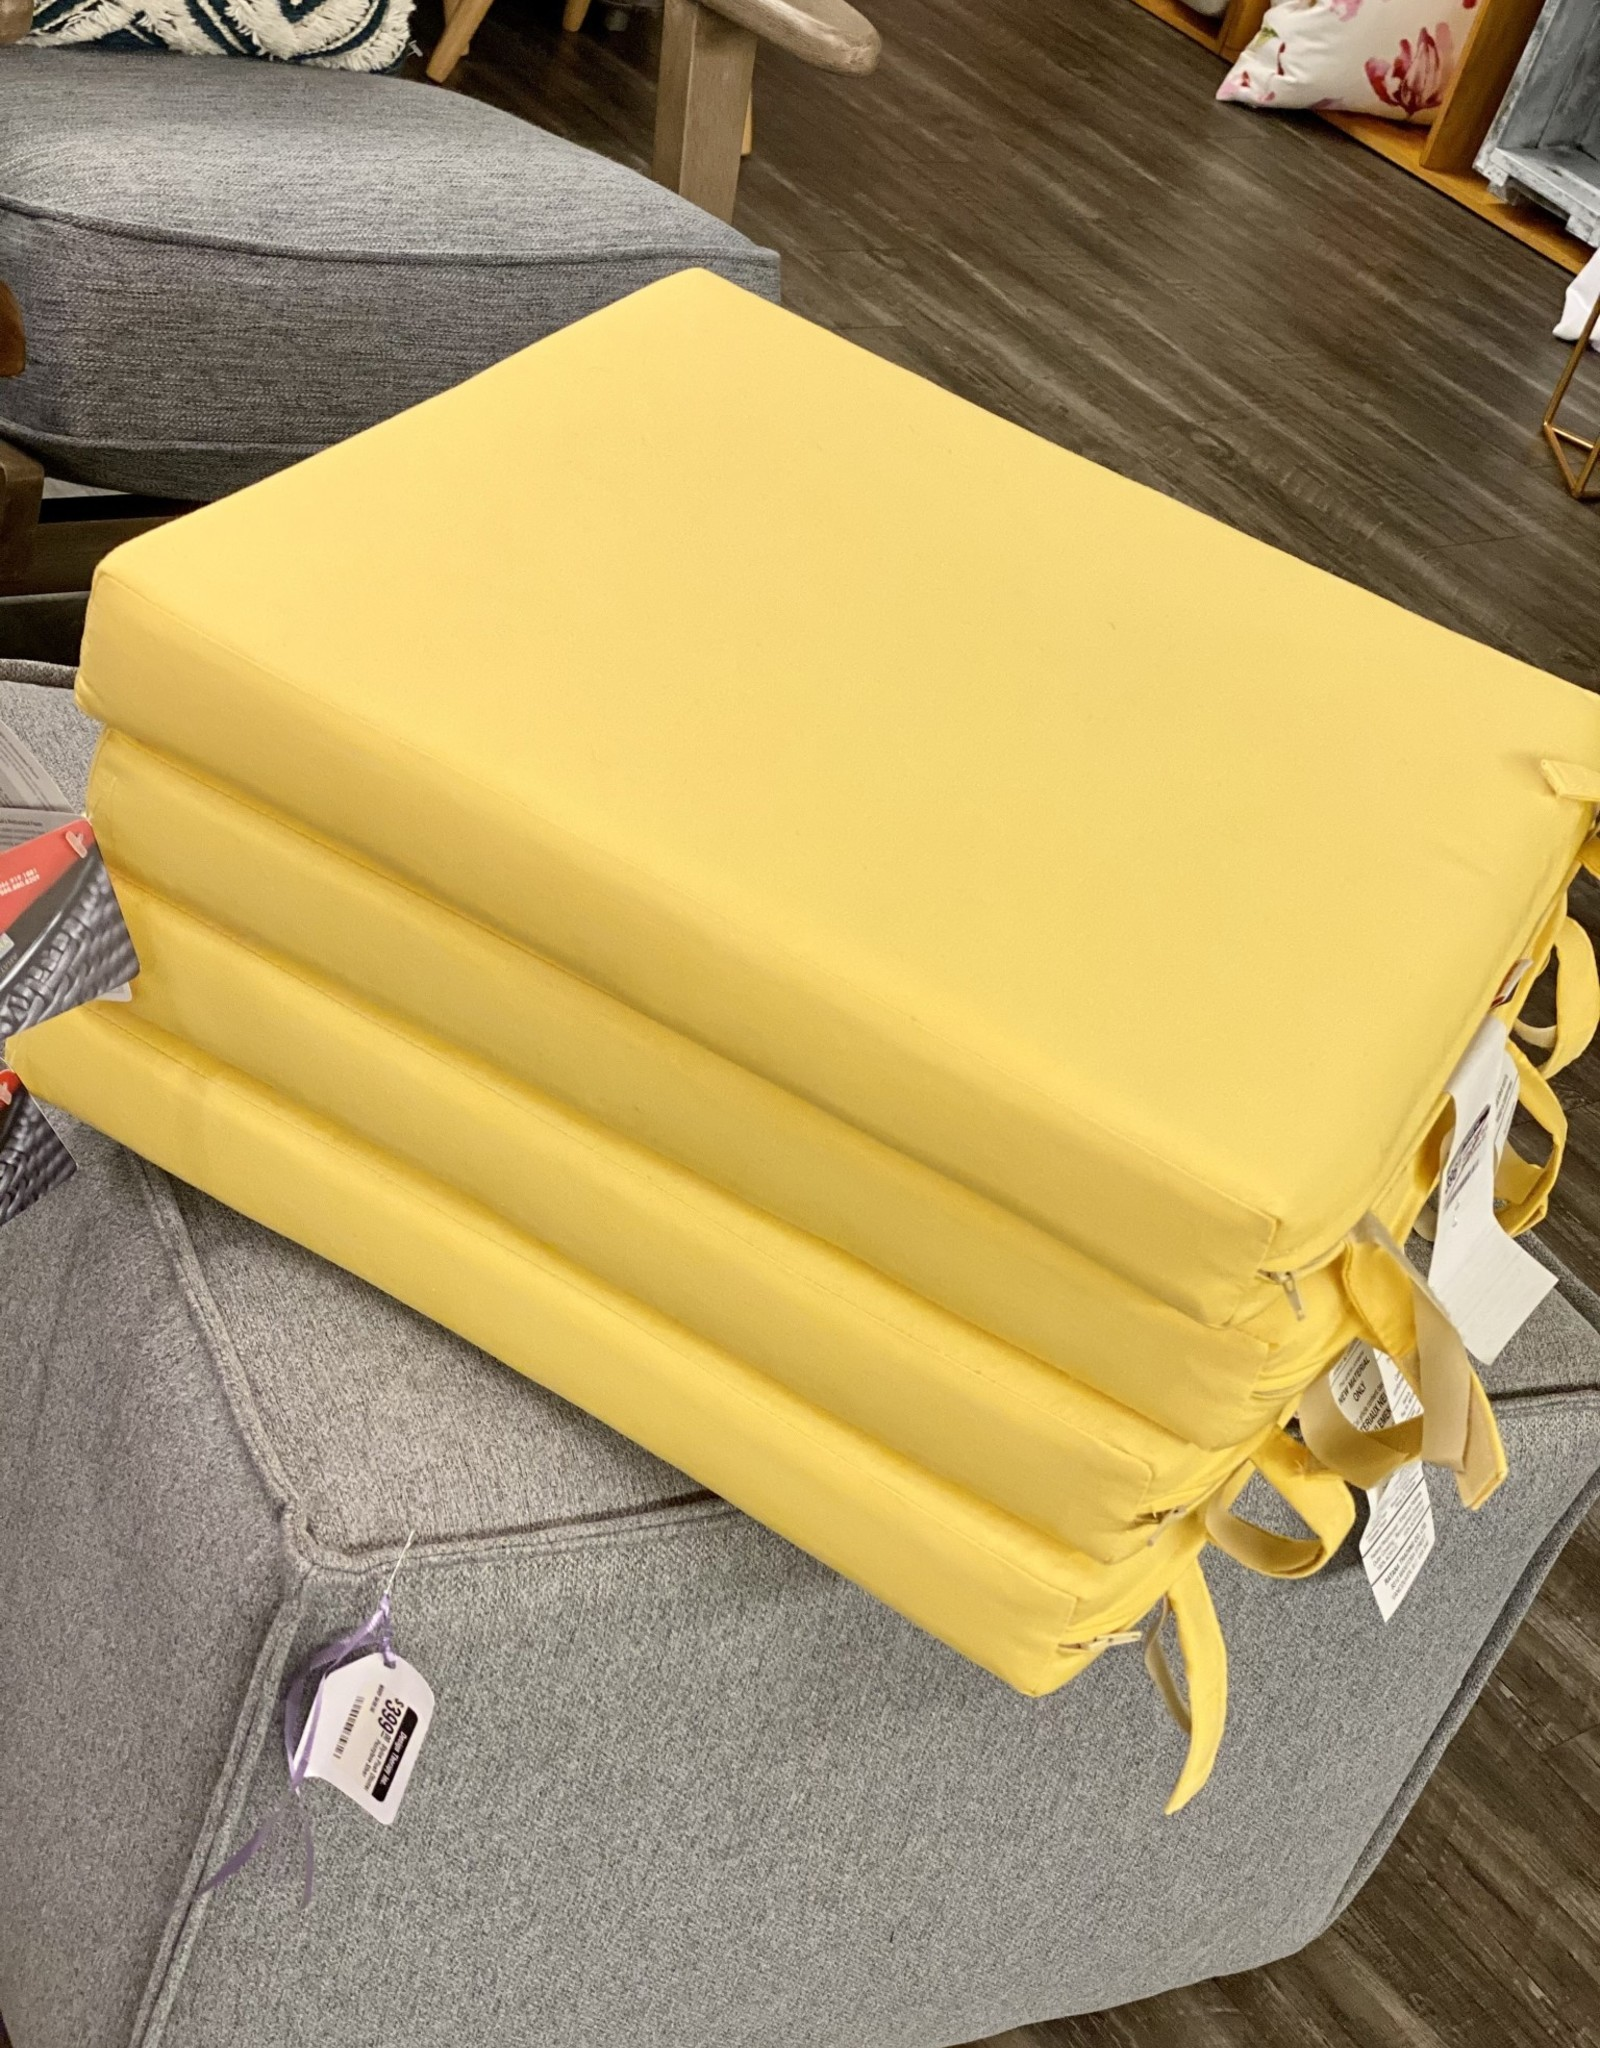 Ratana Cushions Ratana Outdoor Square FO5137 Canvas Buttercup S/4